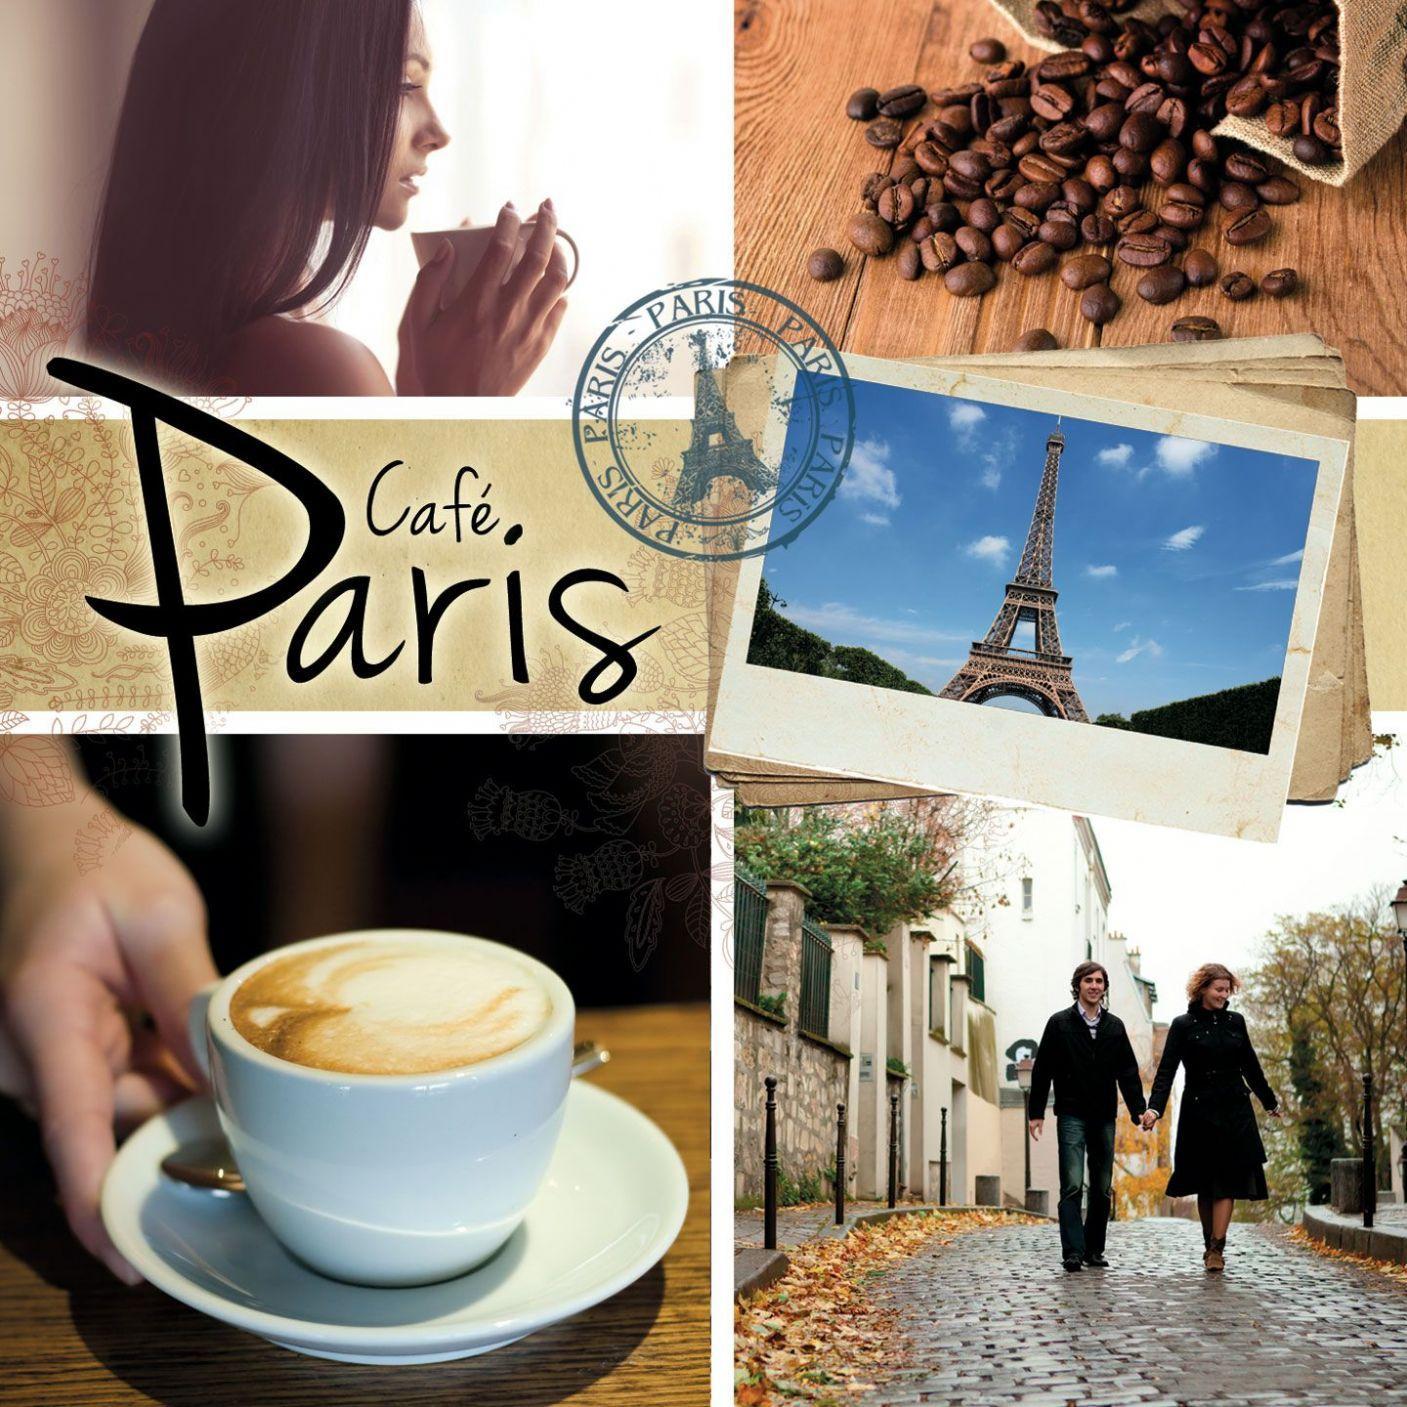 Global Journey Cafe Paris